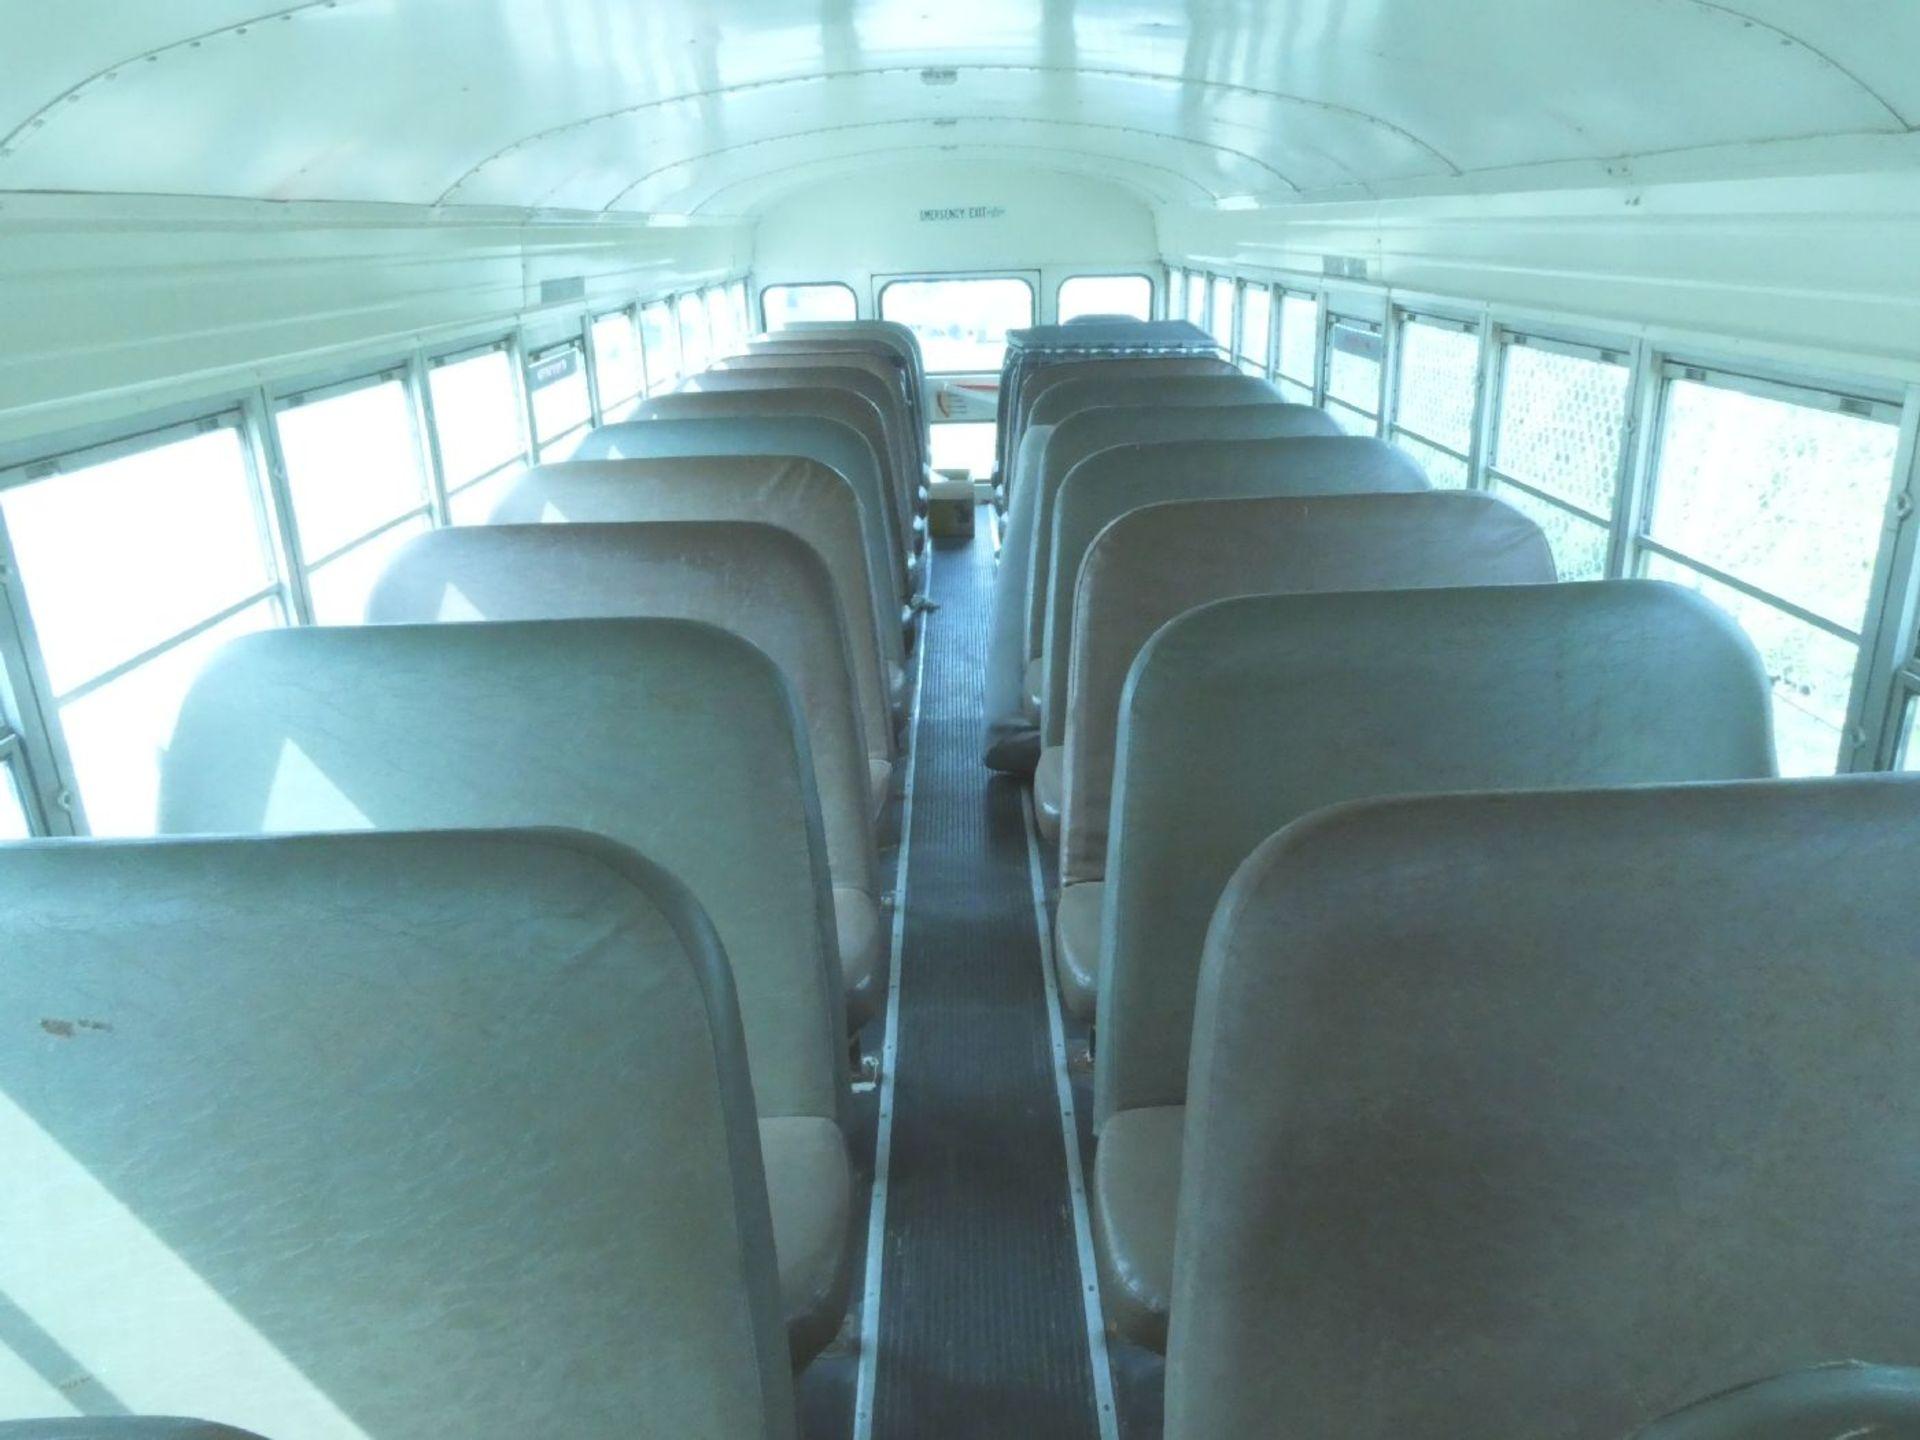 BlueBird School Bus - Image 4 of 4